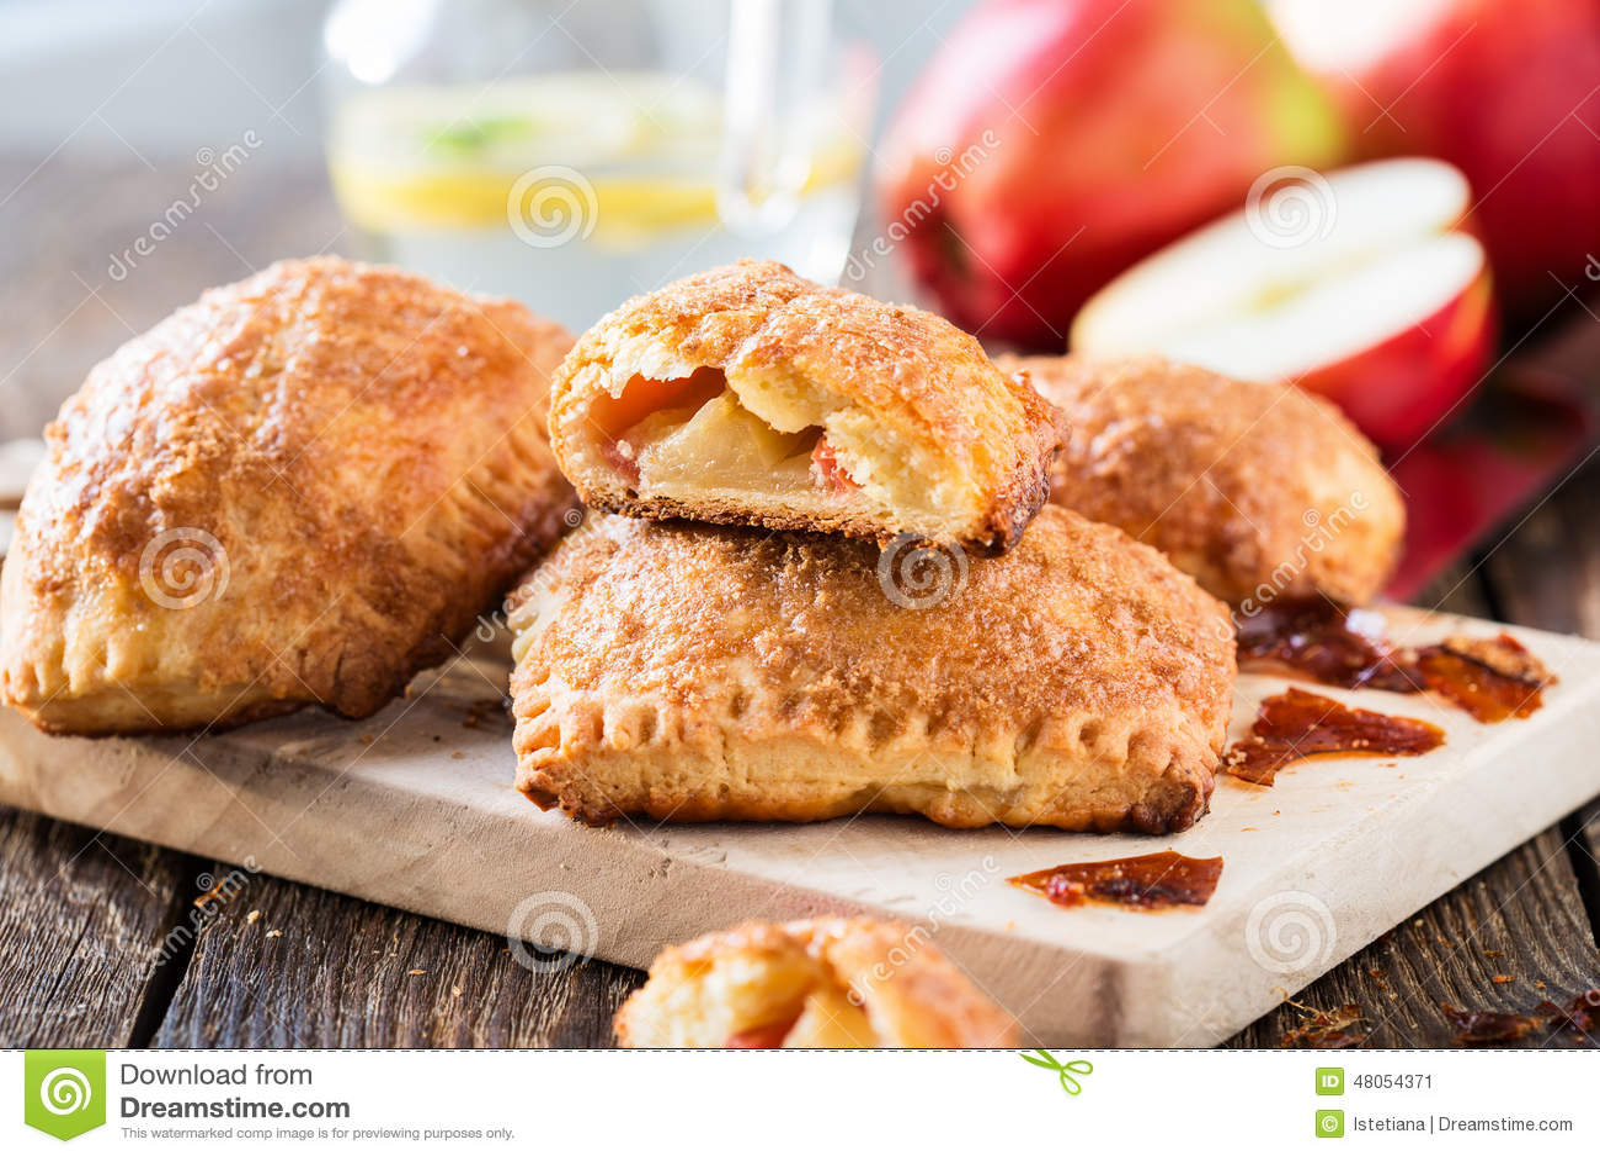 Mini Apple Cinnamon Strudel Stock Photo - Image: 48054371